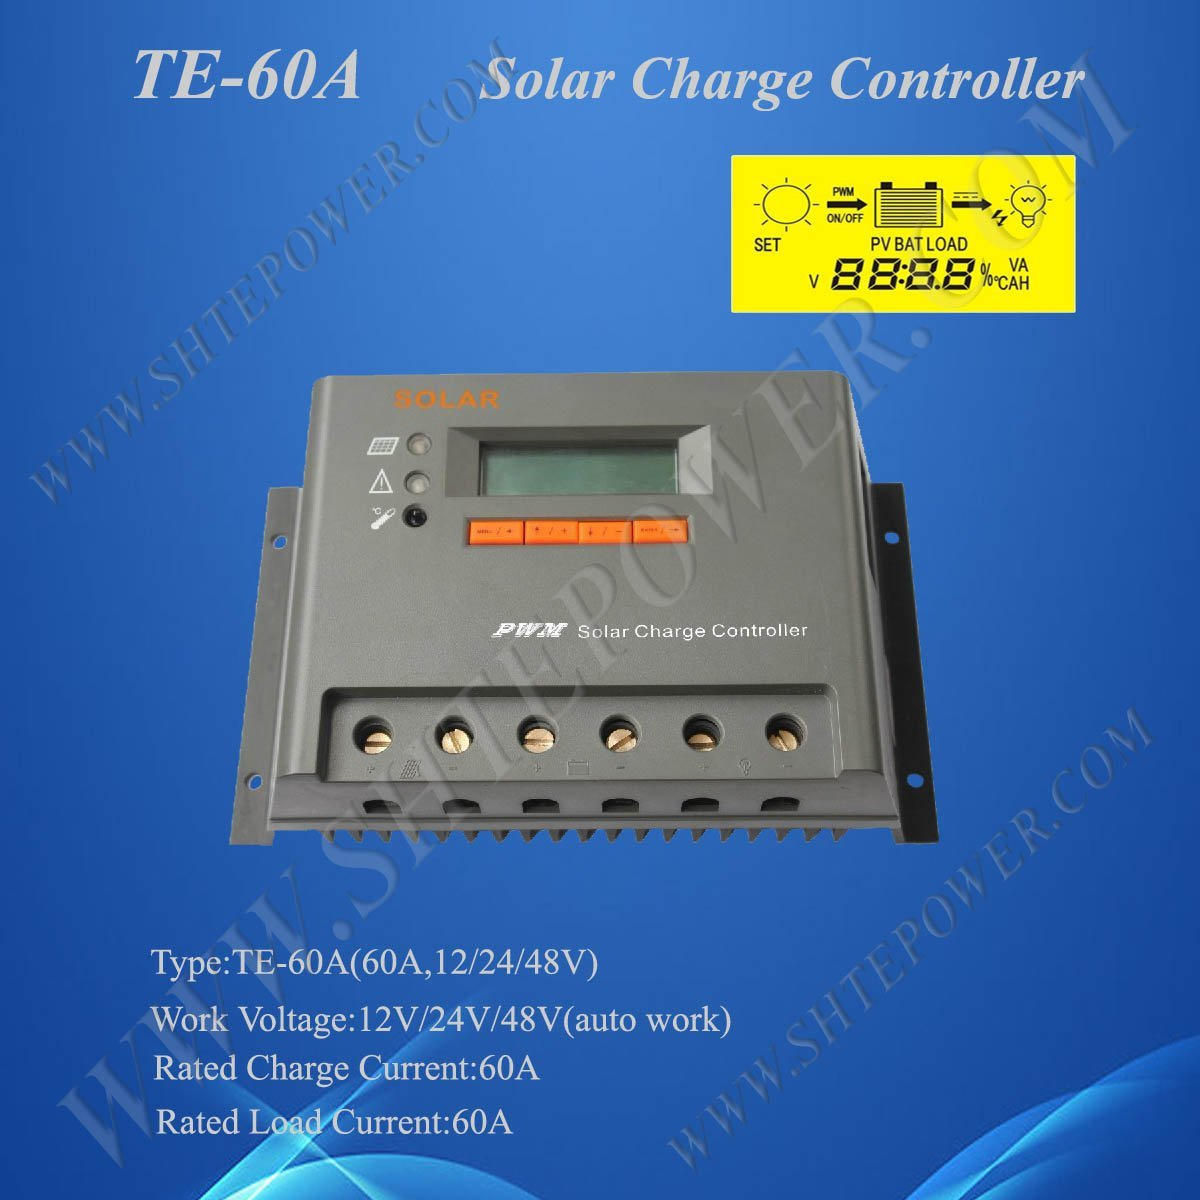 PWM Контроллер заряда солнечной батареи 60A 12 V/24 V/48 V автоматическая работа, 2 года гарантии, CE& ROHS утвержден